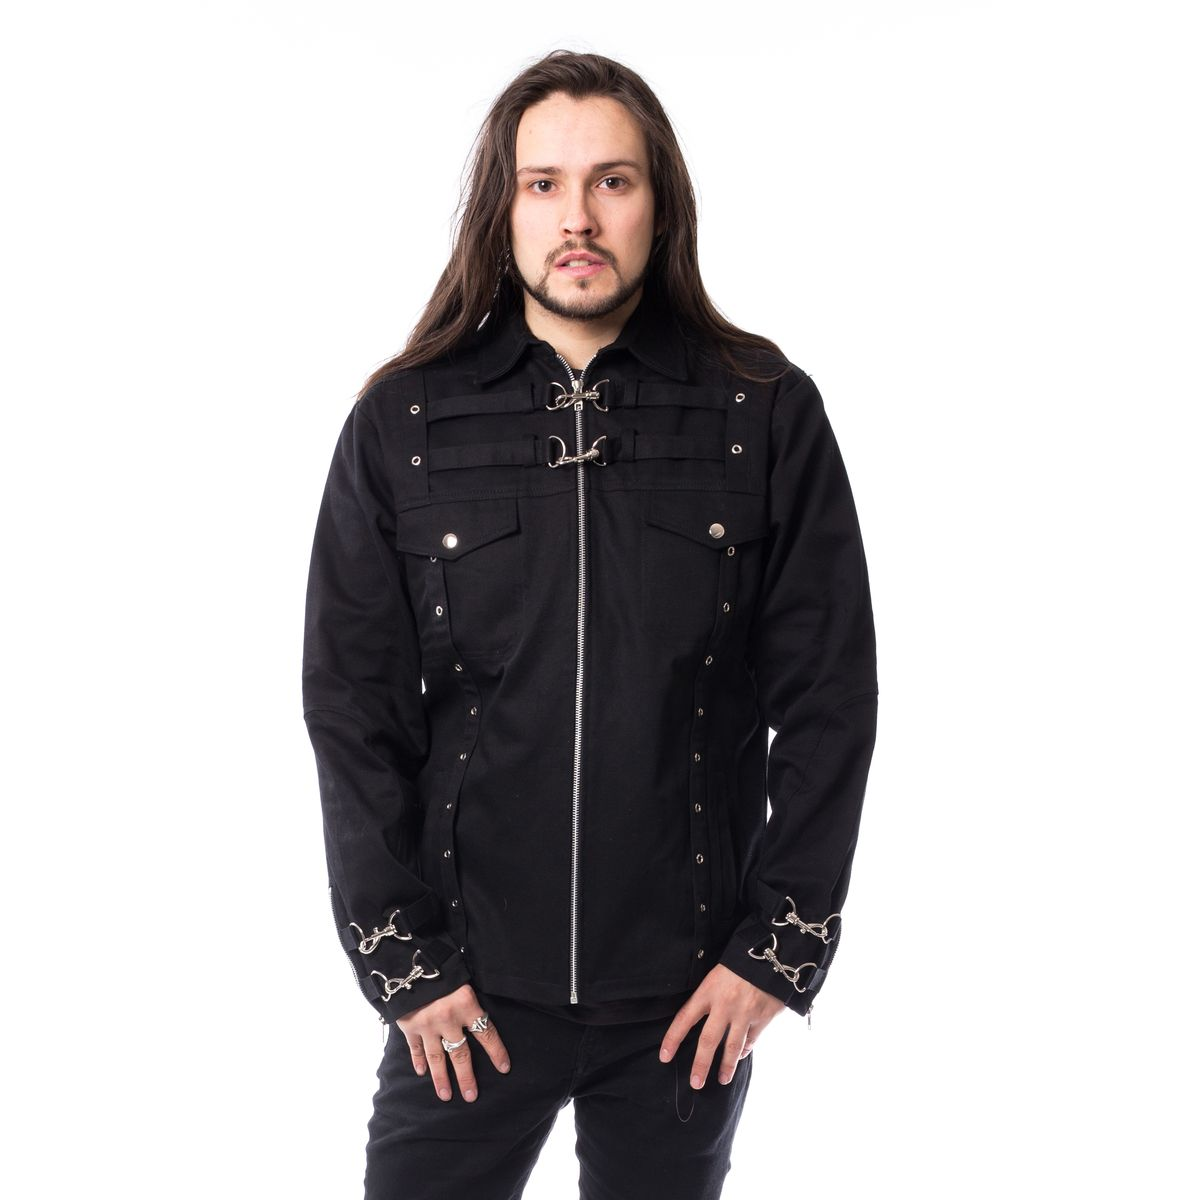 gothic jacke military style herren